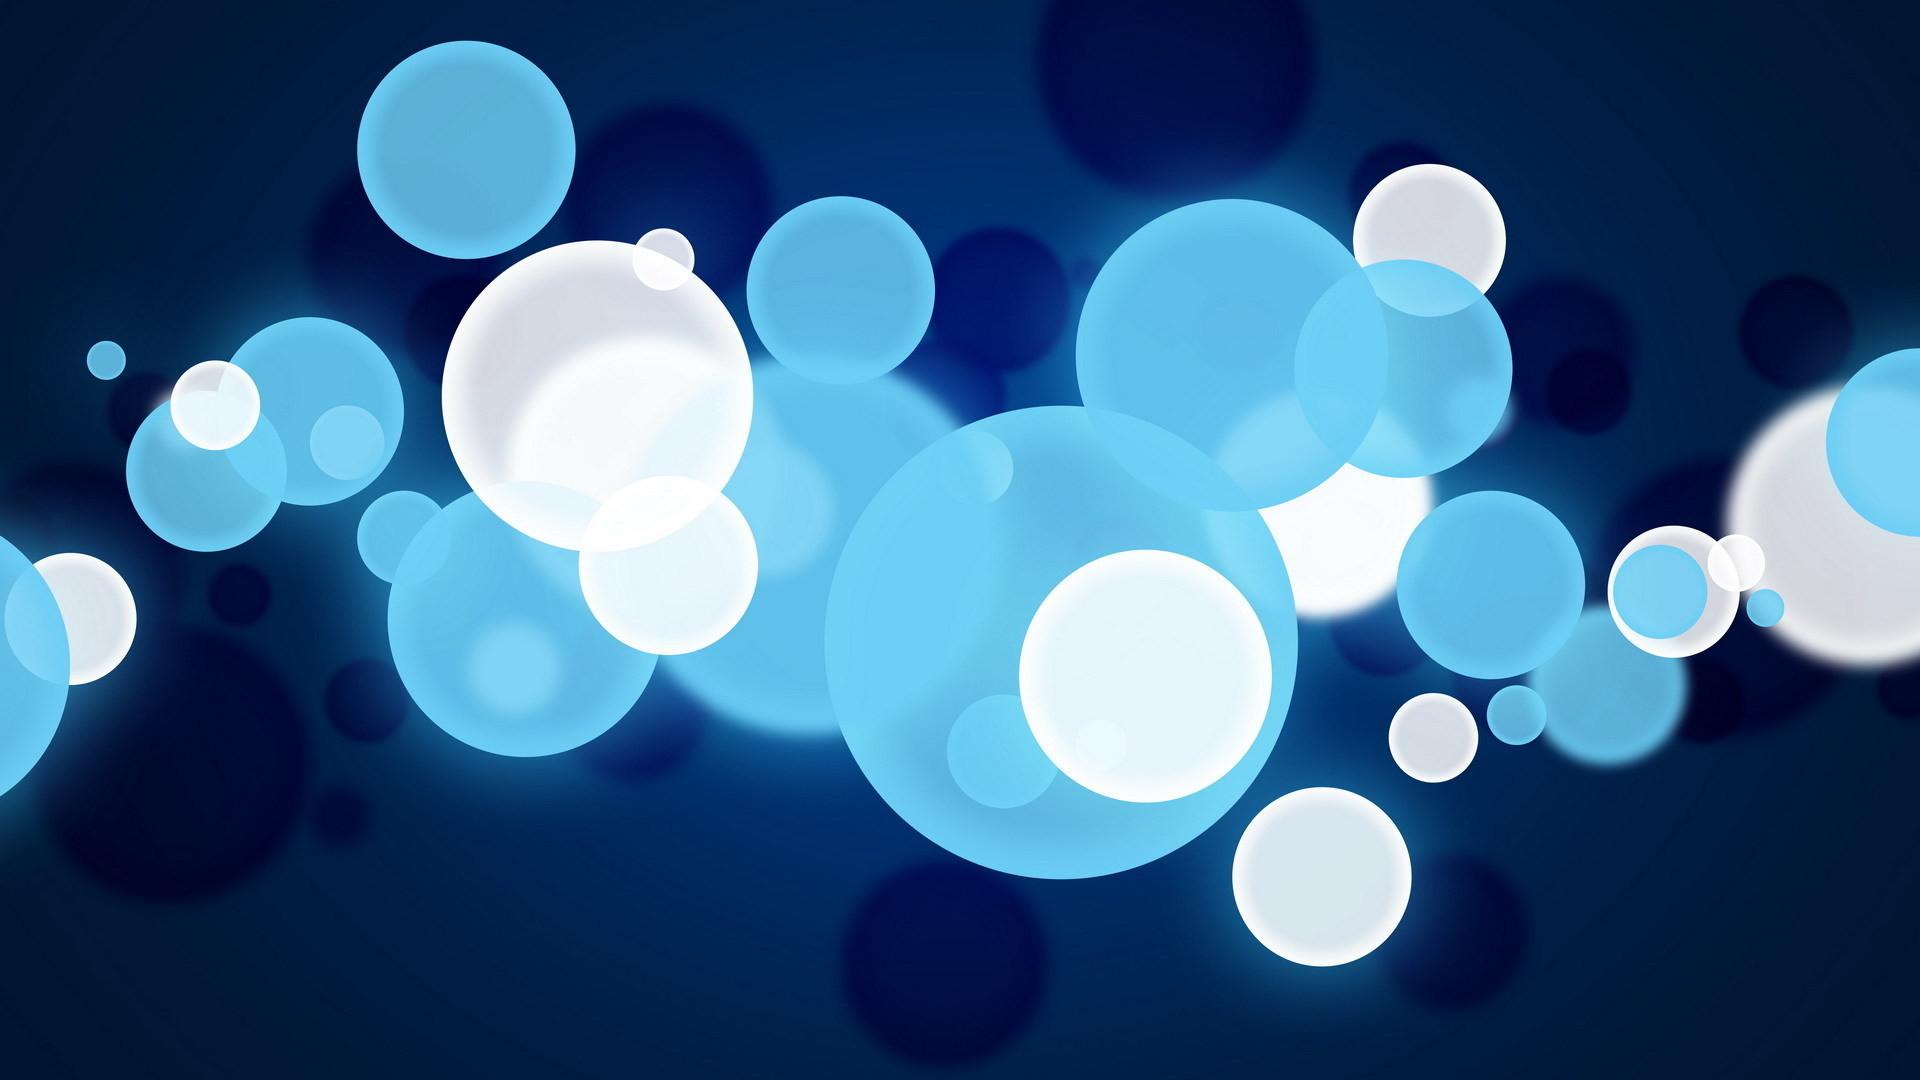 1920x1080 Pattern Light Blue White Wallpaper Download 2560x1440 Standard